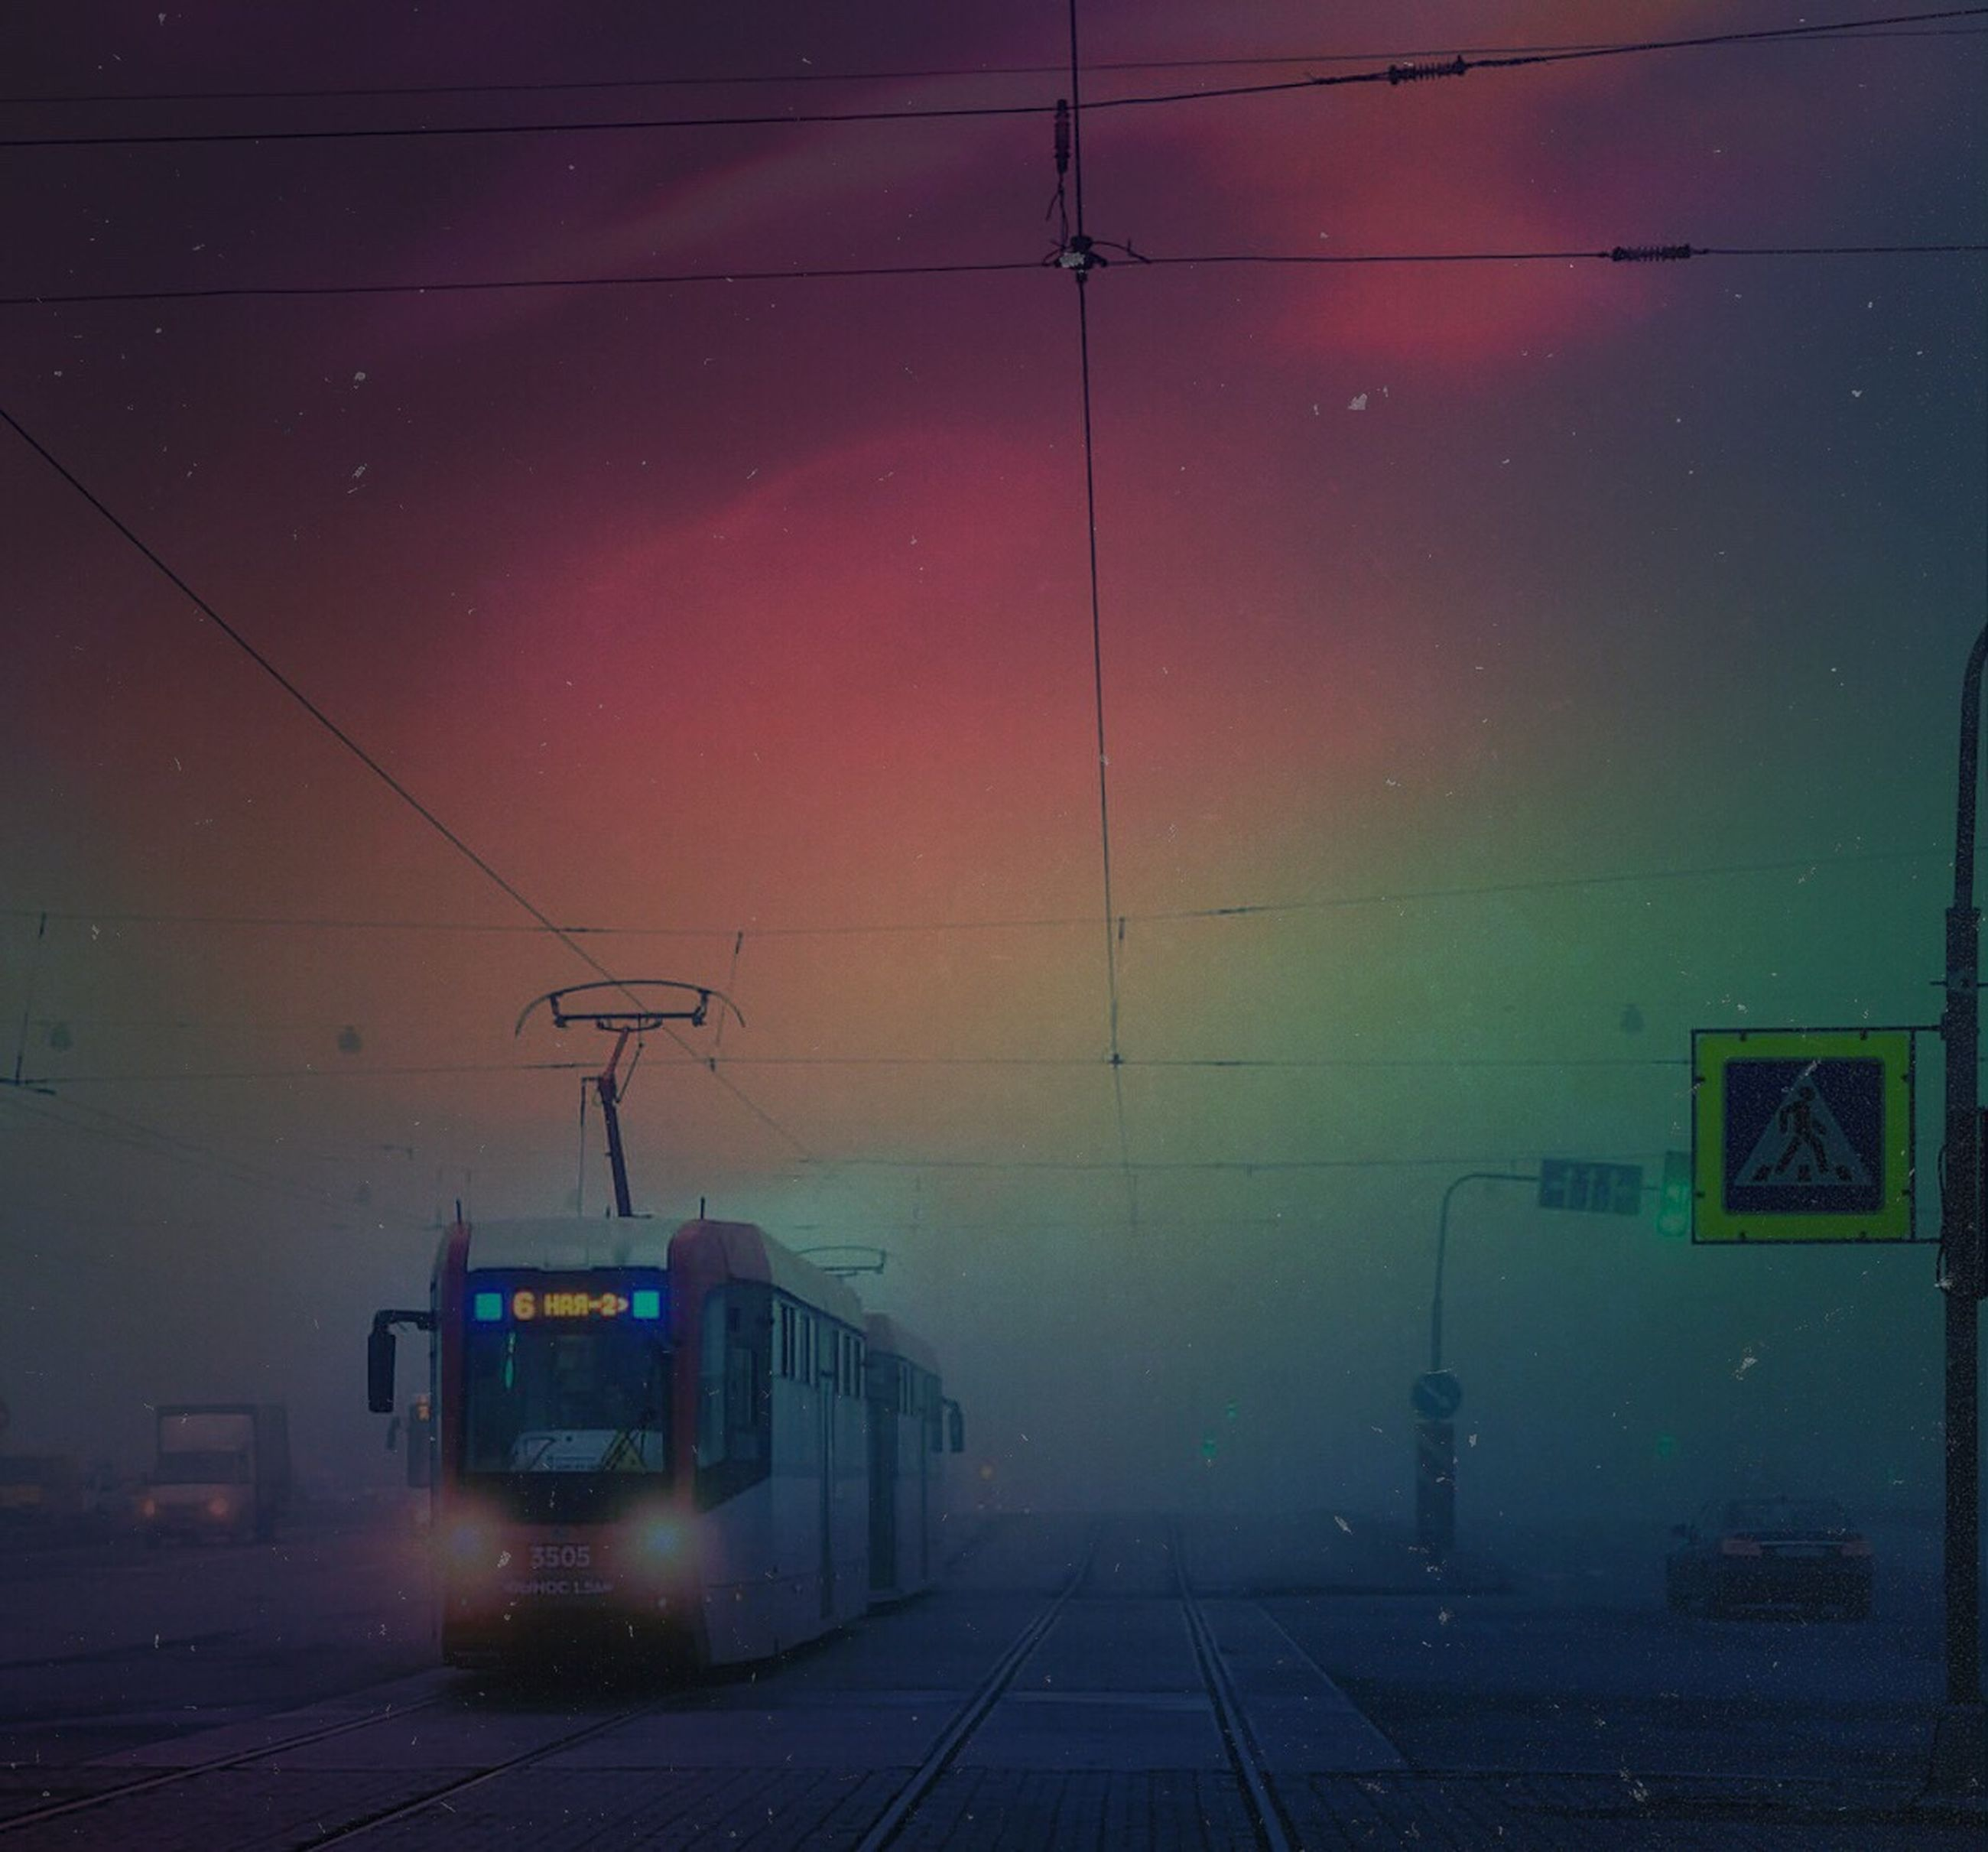 transportation, railroad track, night, rail transportation, public transportation, mode of transport, train - vehicle, illuminated, sky, cable, no people, nature, outdoors, electricity pylon